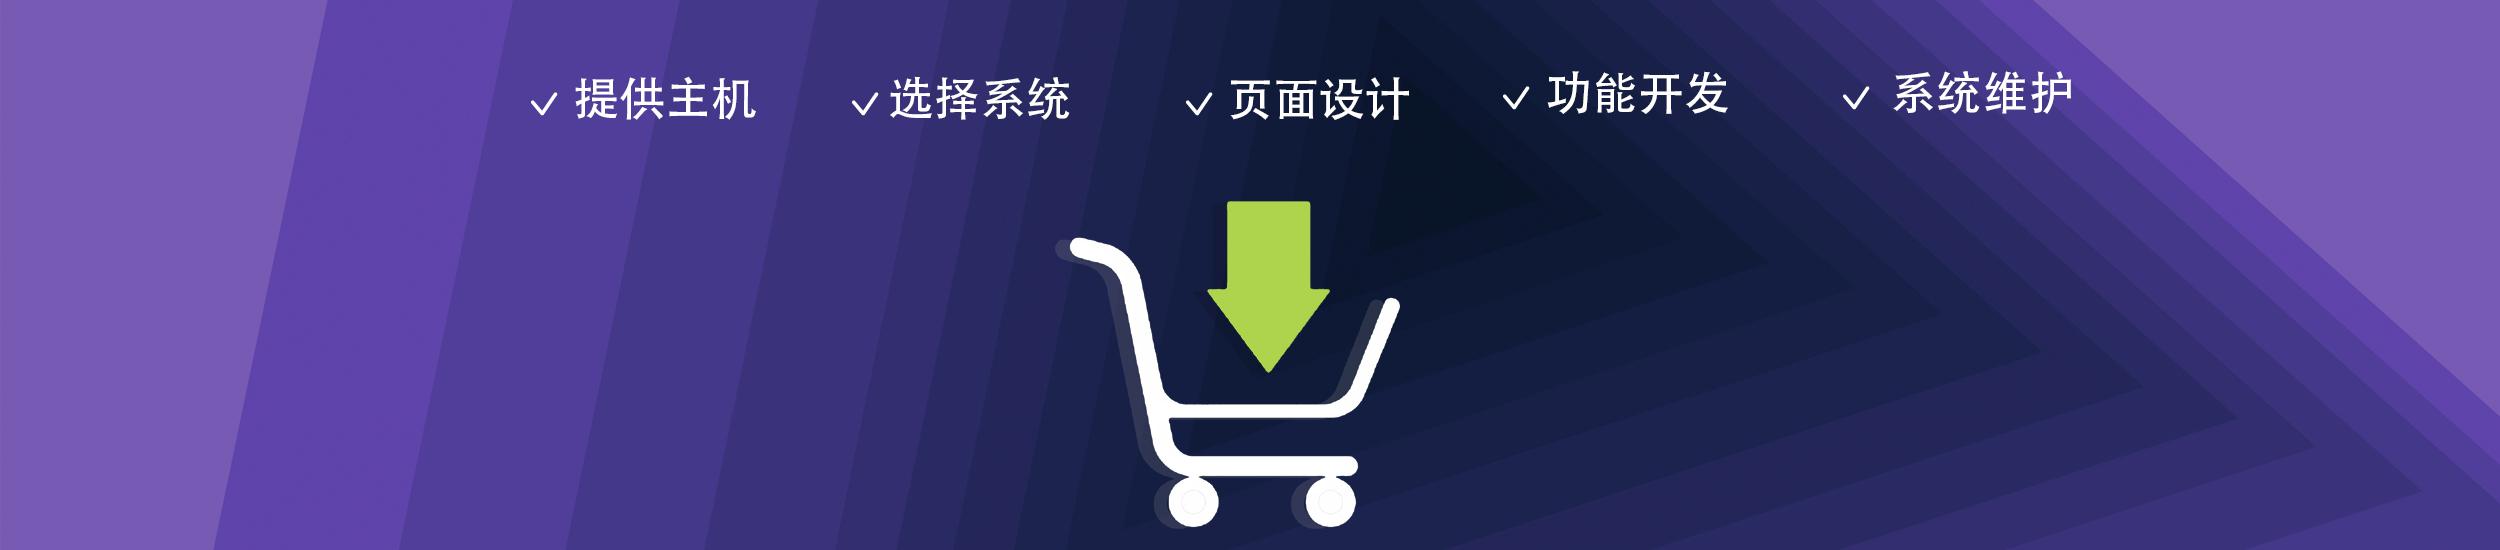 banner-onlineshop